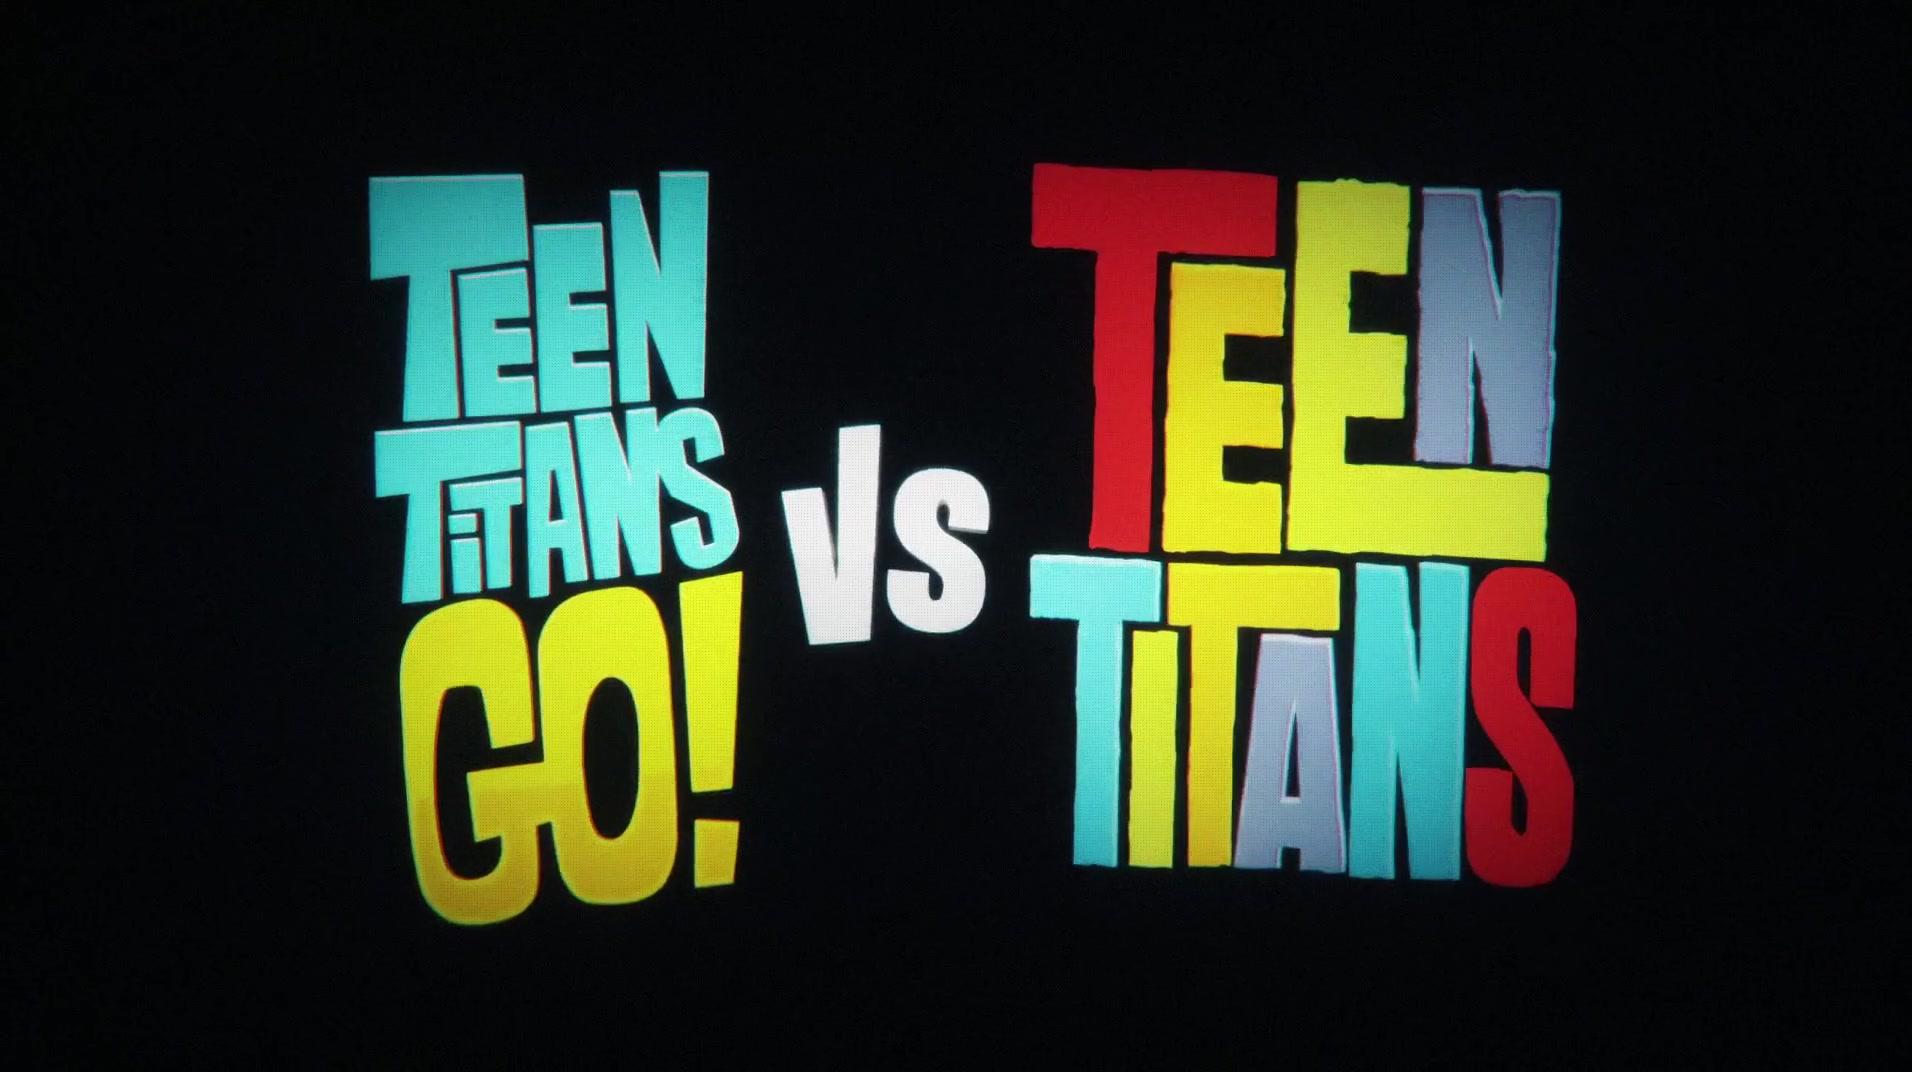 teen_titans_go_vs_teen_titans_2019_1080p_webrip_x264-rarbg_00173.jpg